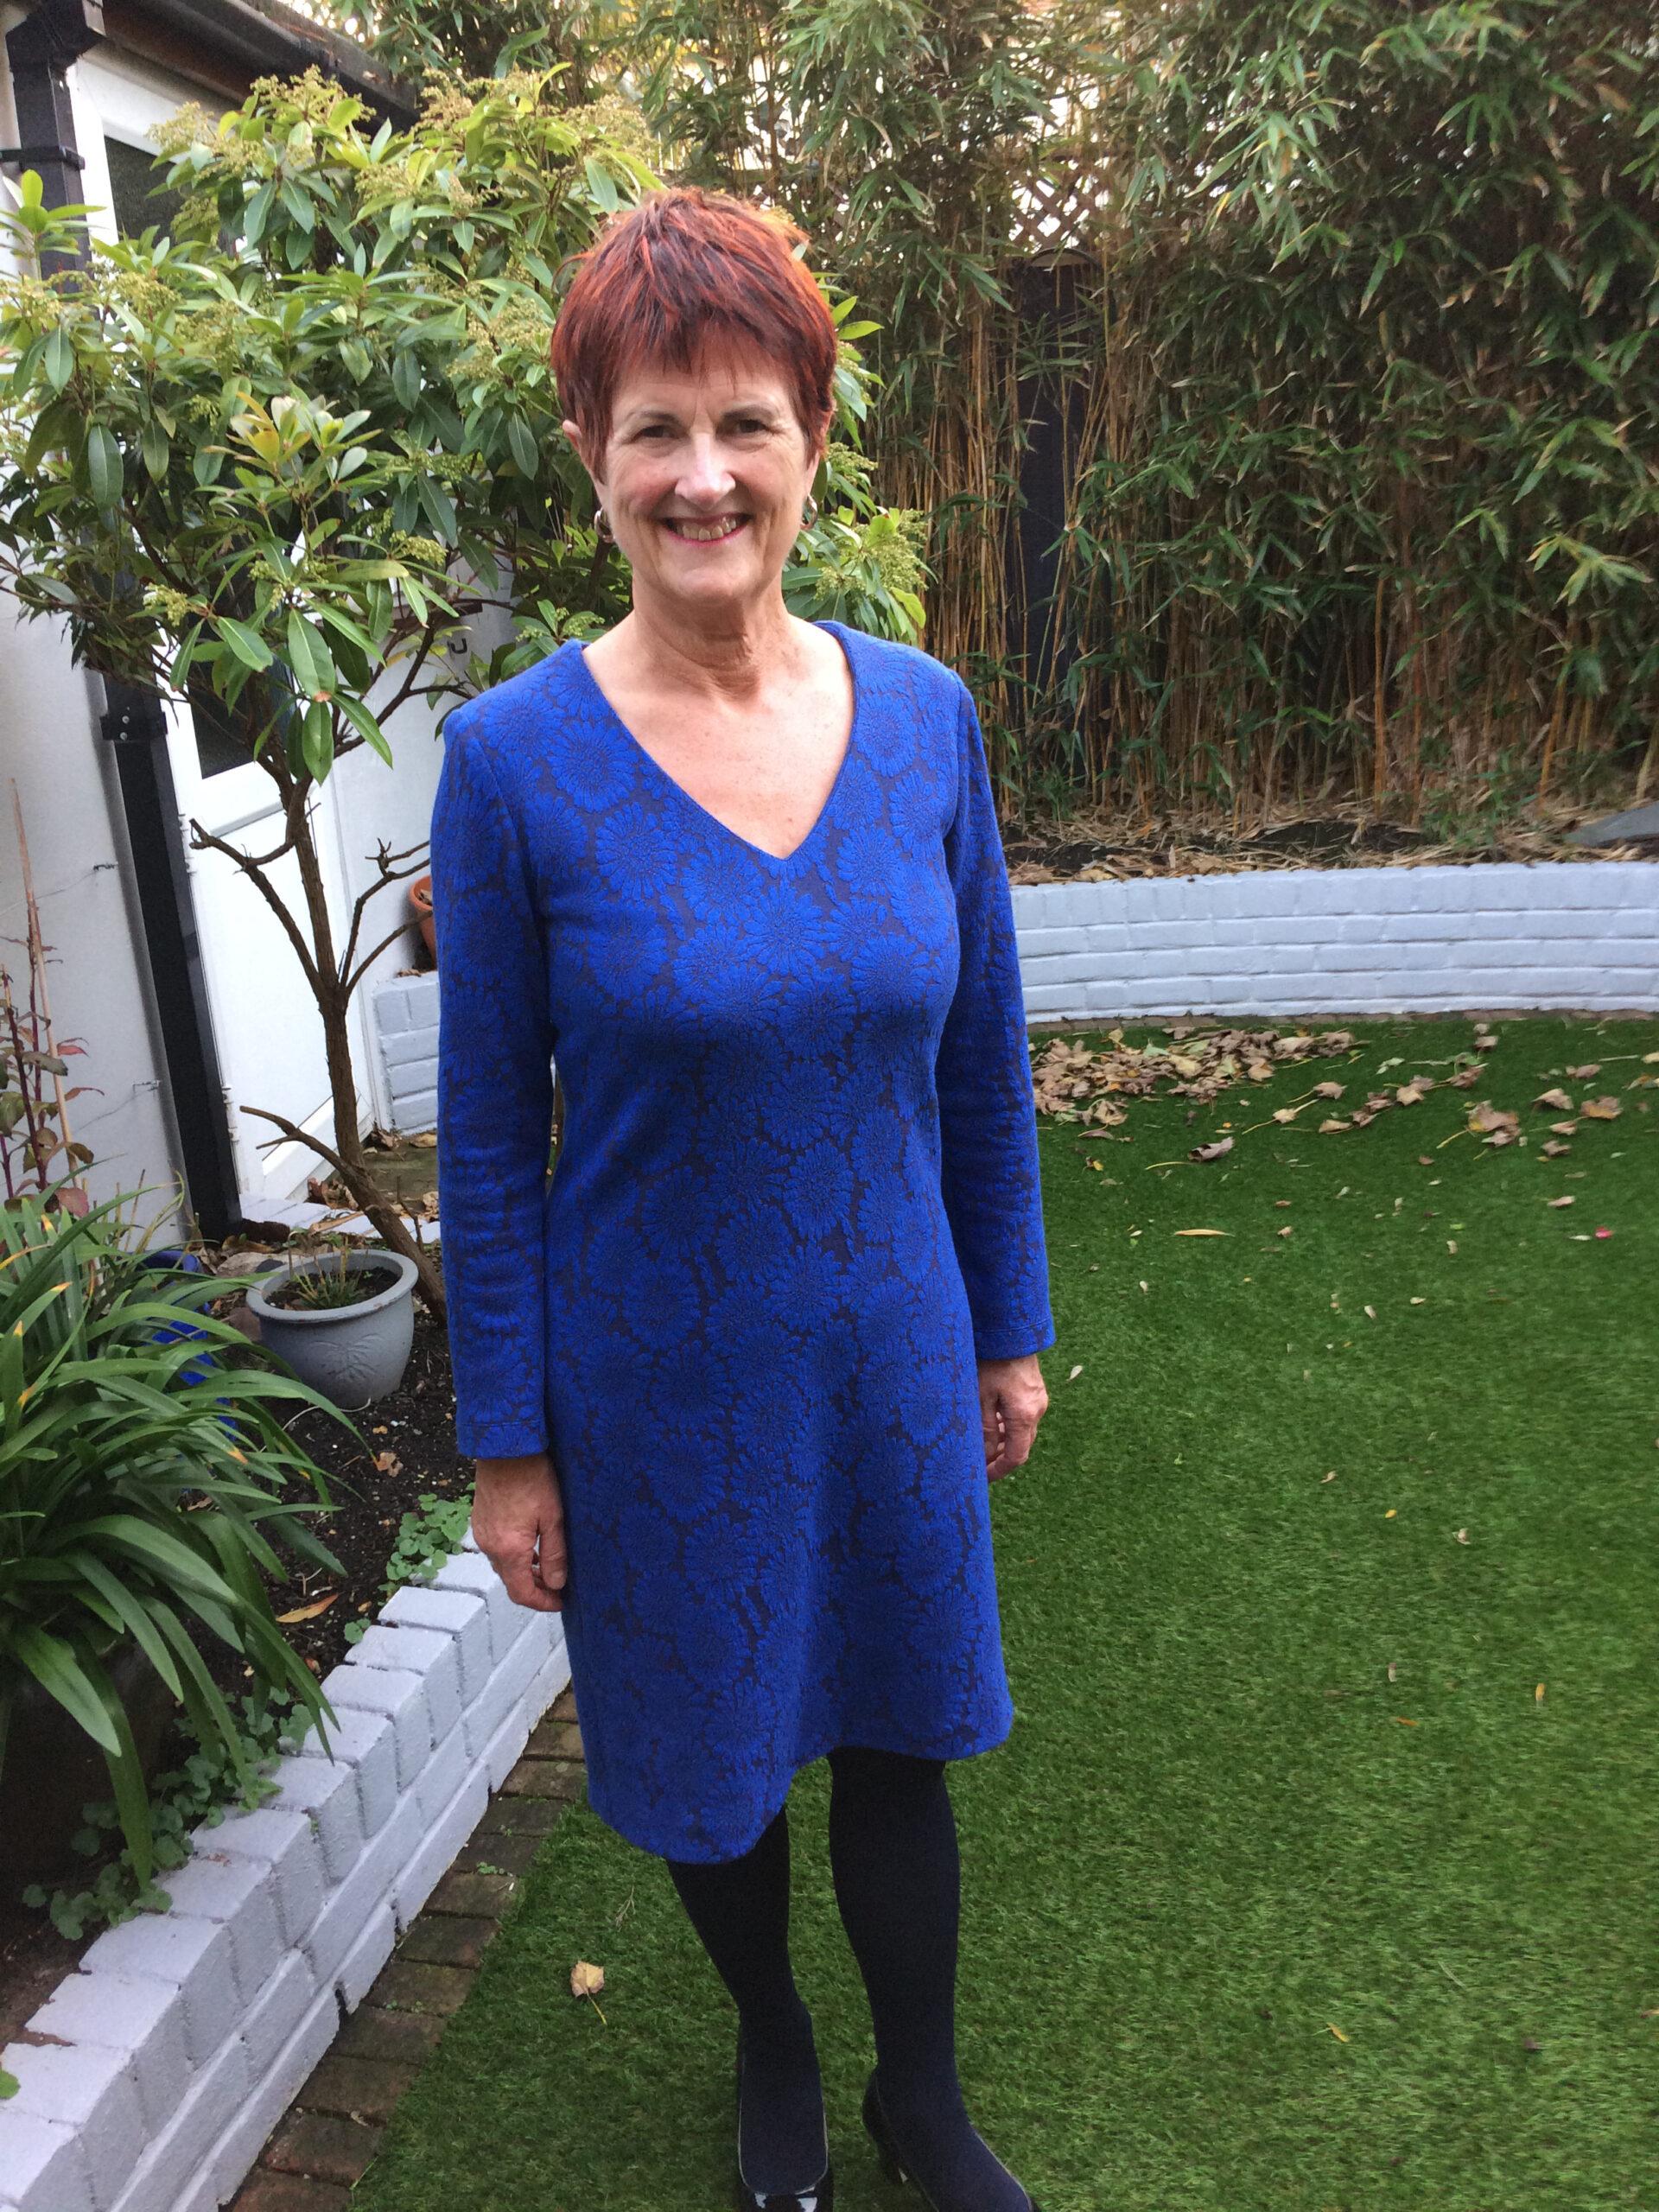 cobalt floral viscose mix jacquard jersey dress